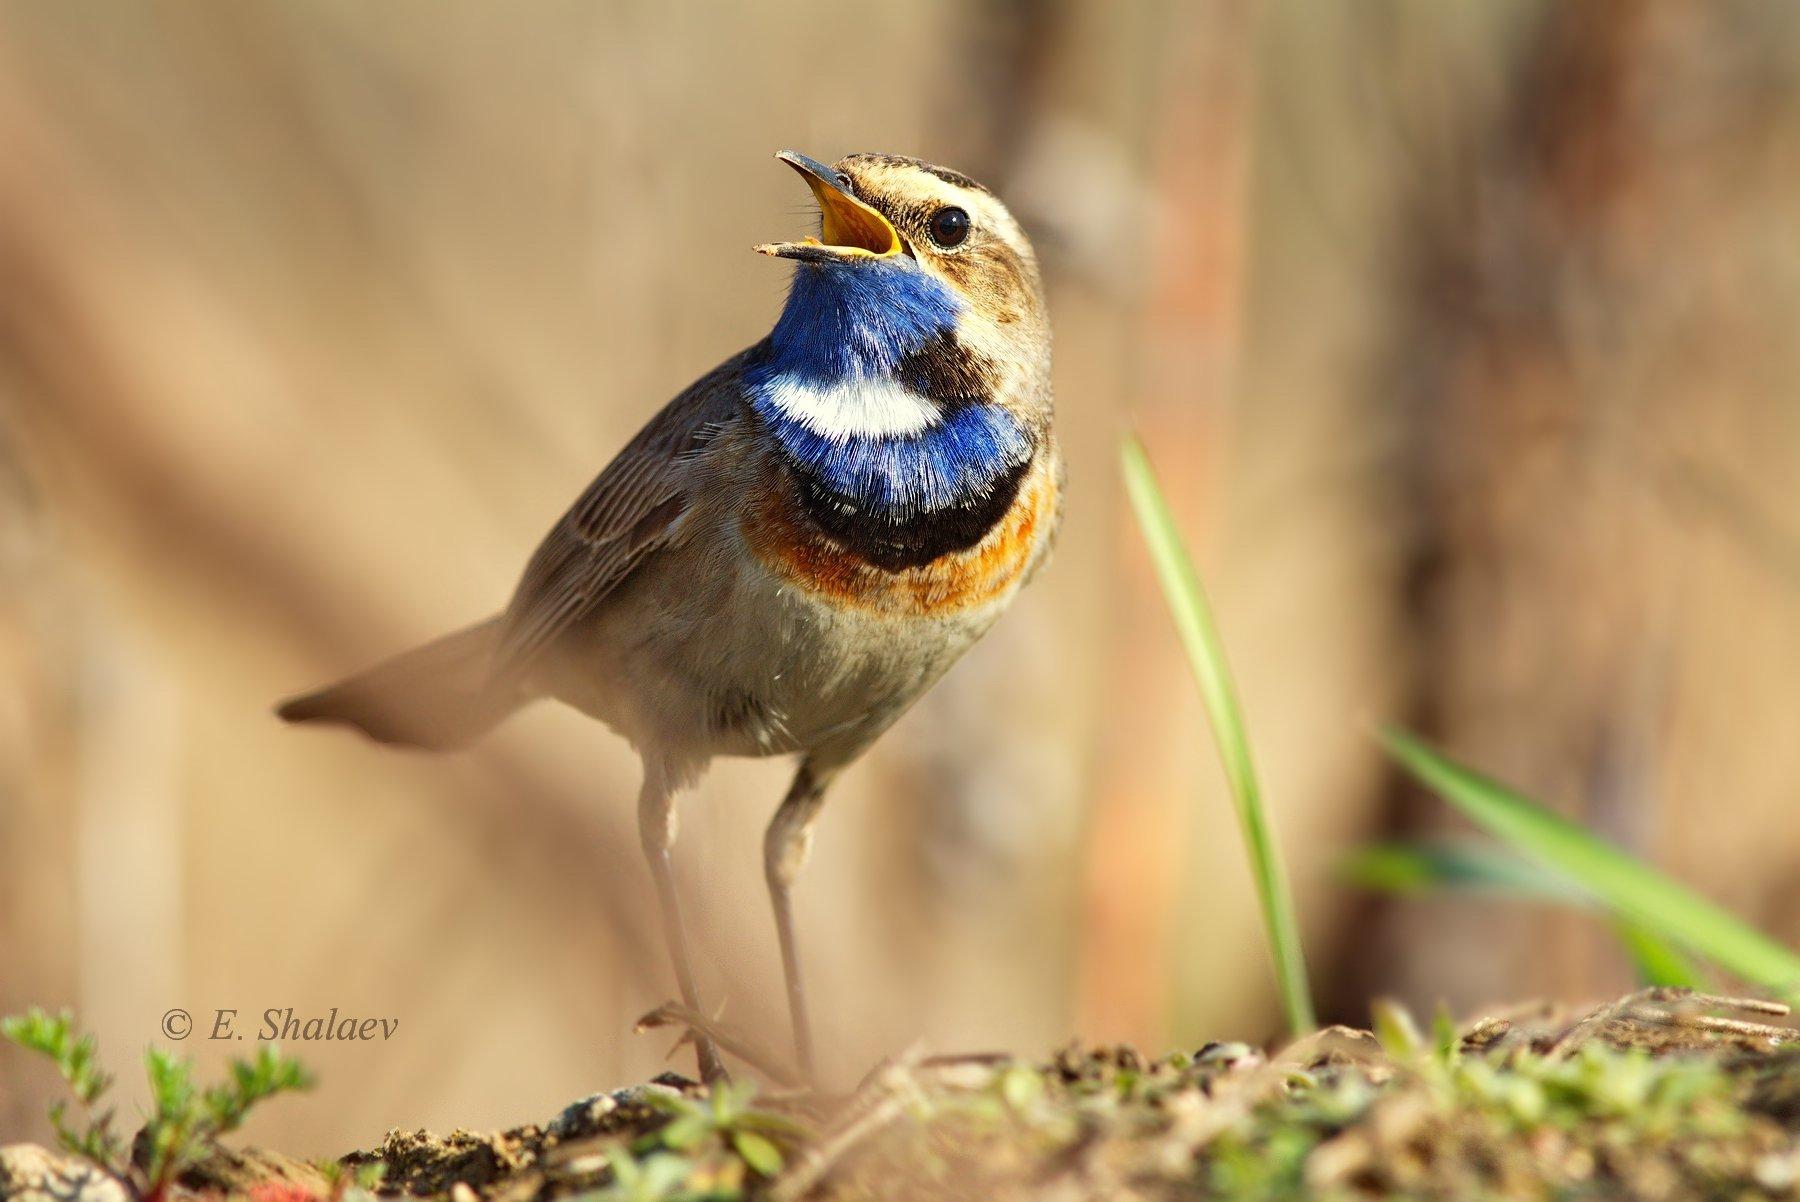 birds,bluethroat,luscinia svecica,варакушка,птица,птицы, Евгений